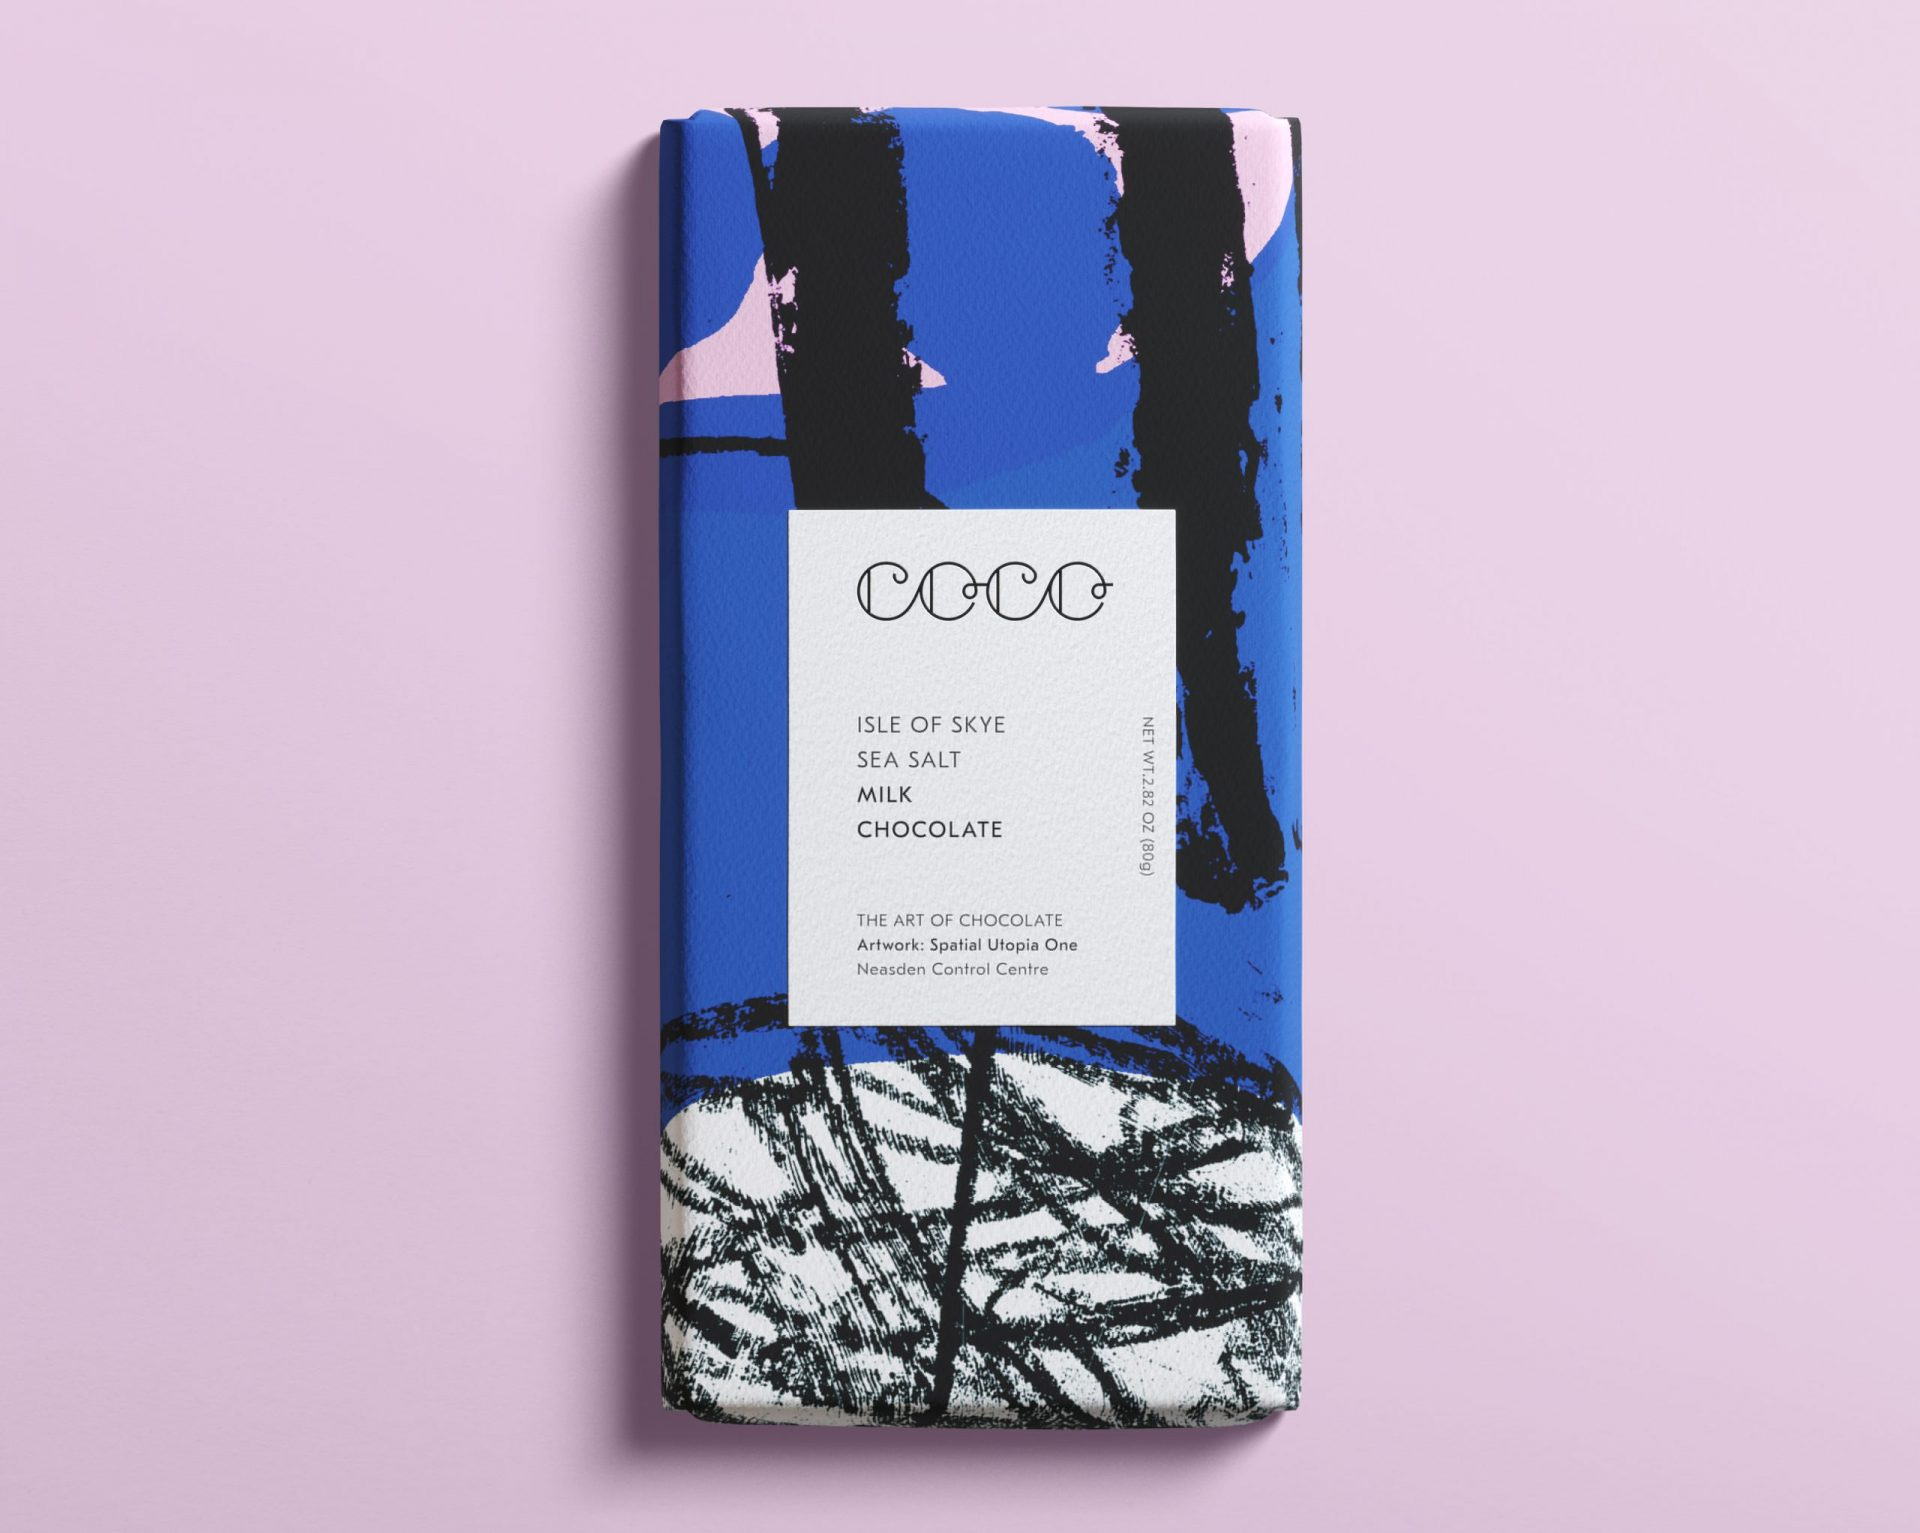 Coco Chocolatier Isle of Skye Sea Salt Milk Chocolate